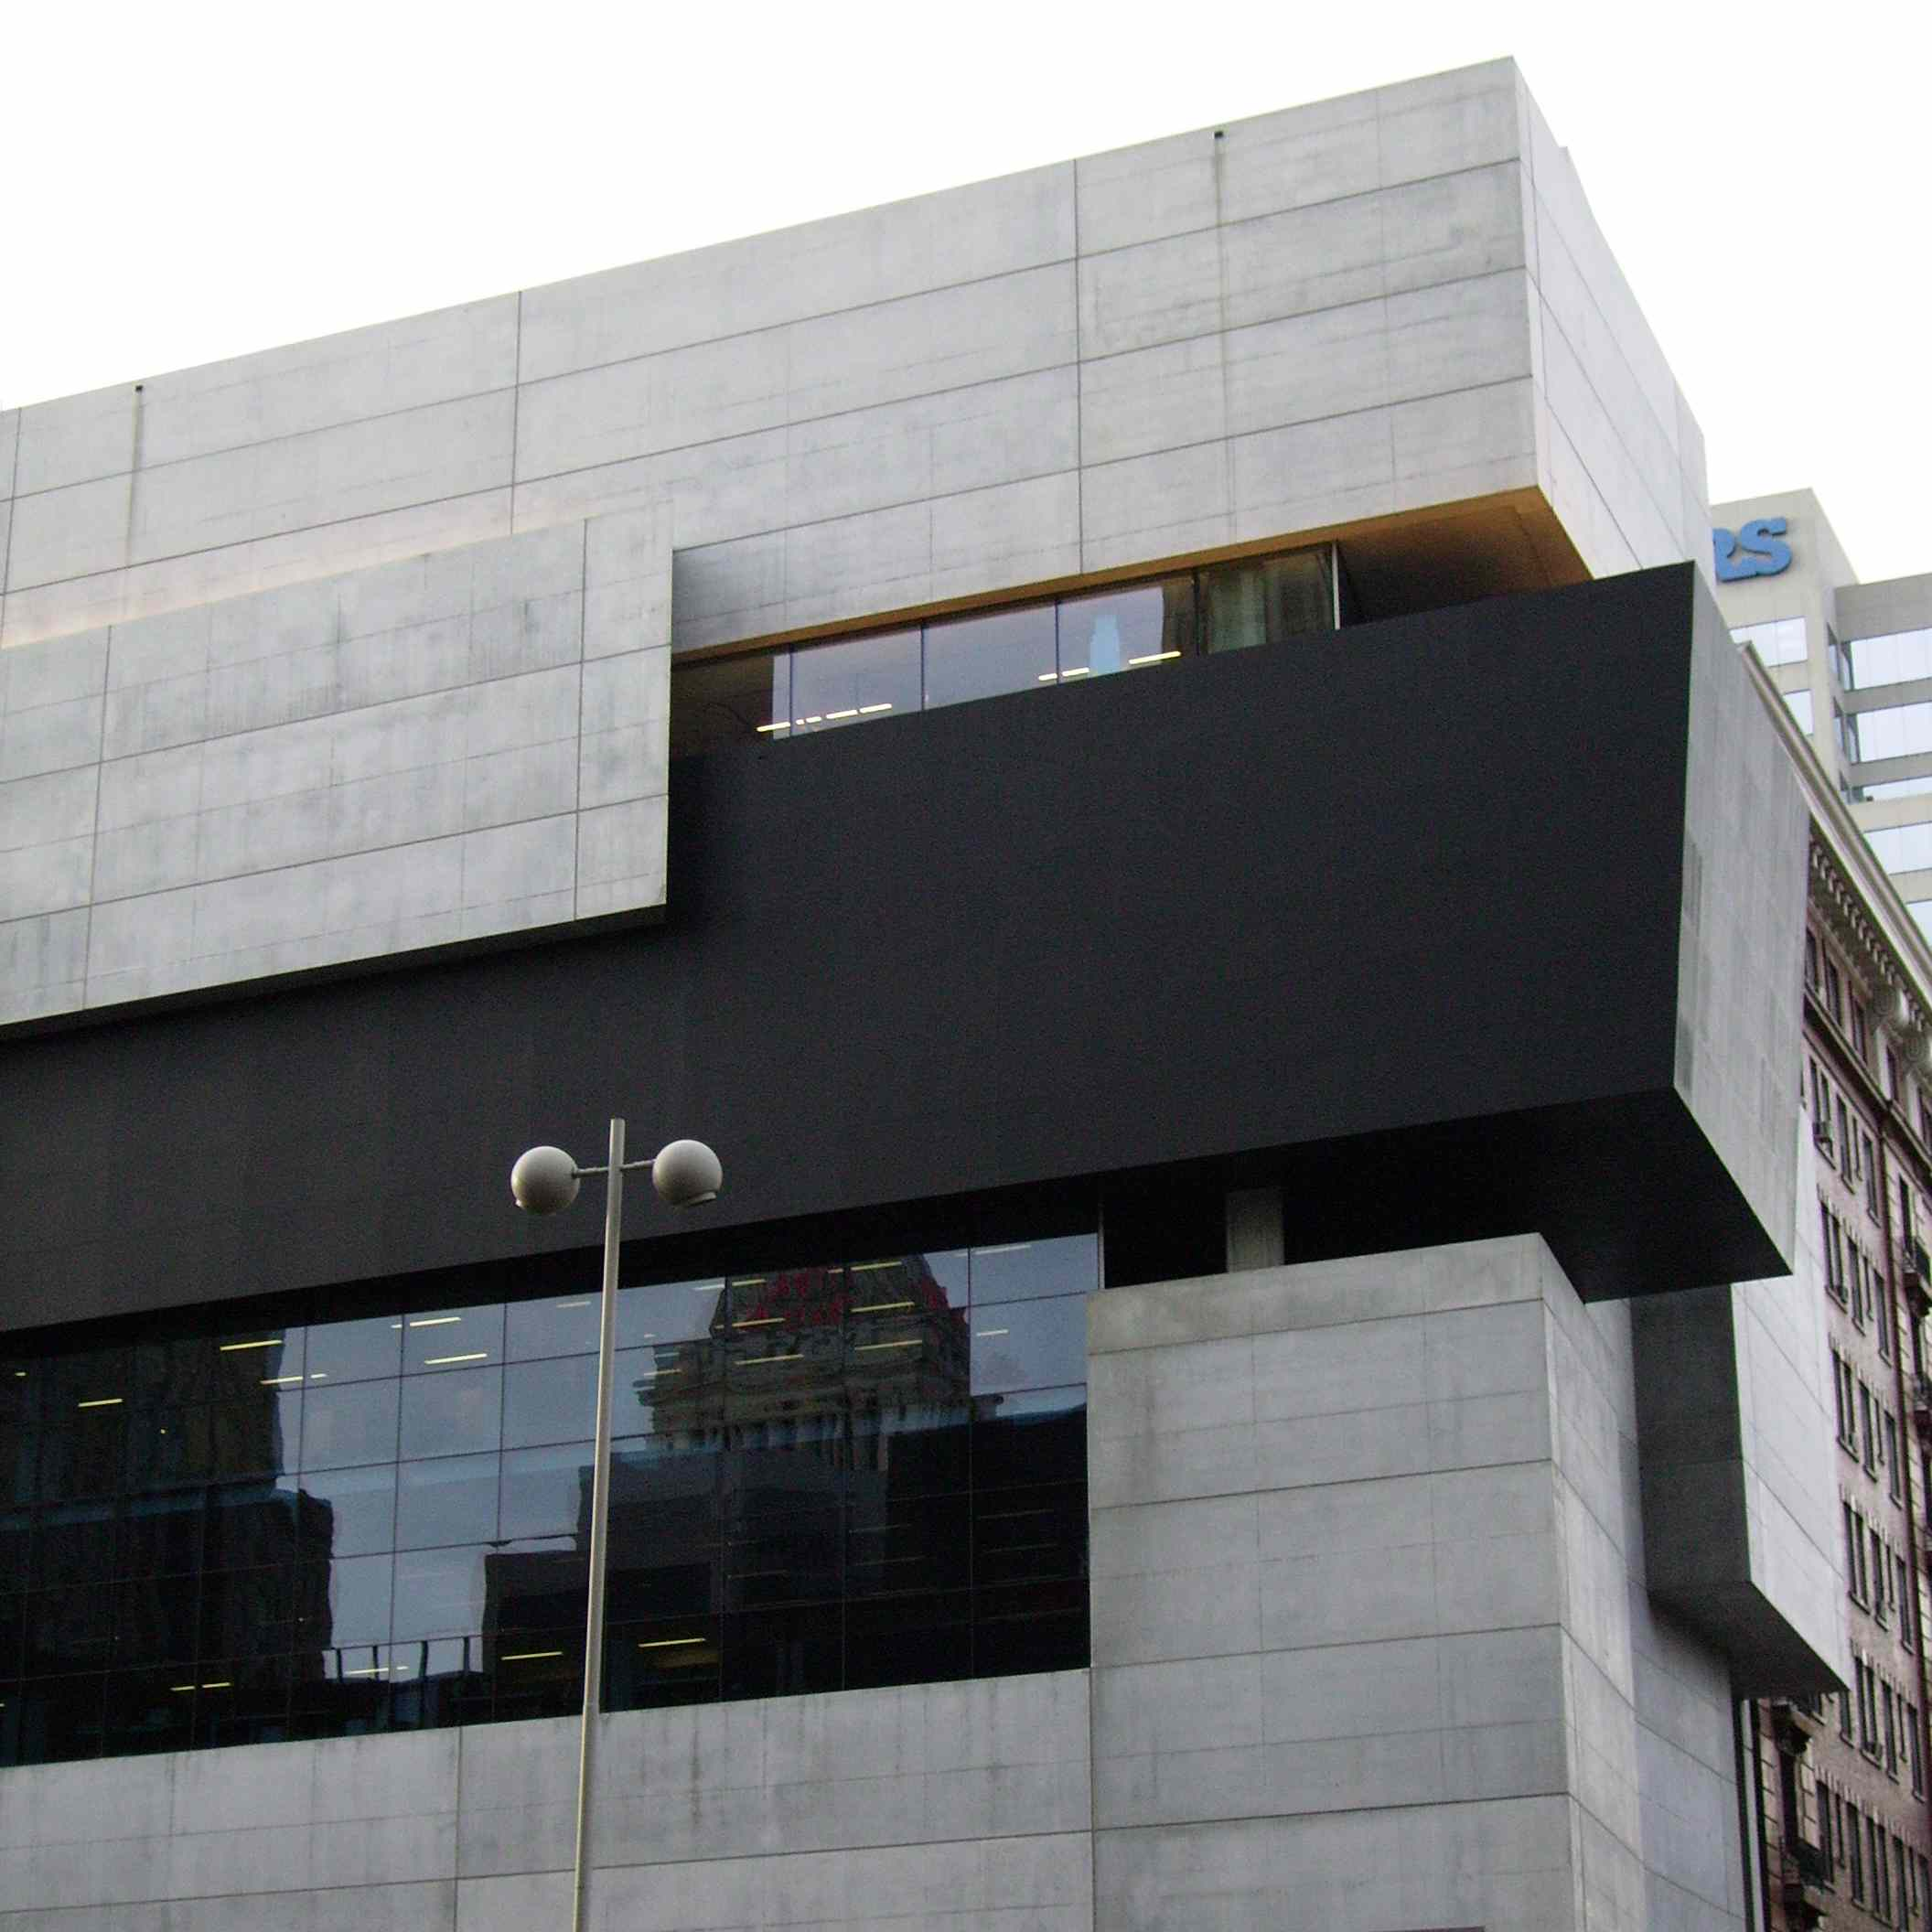 Exterior of Contemporary Art Center Cincinnatti